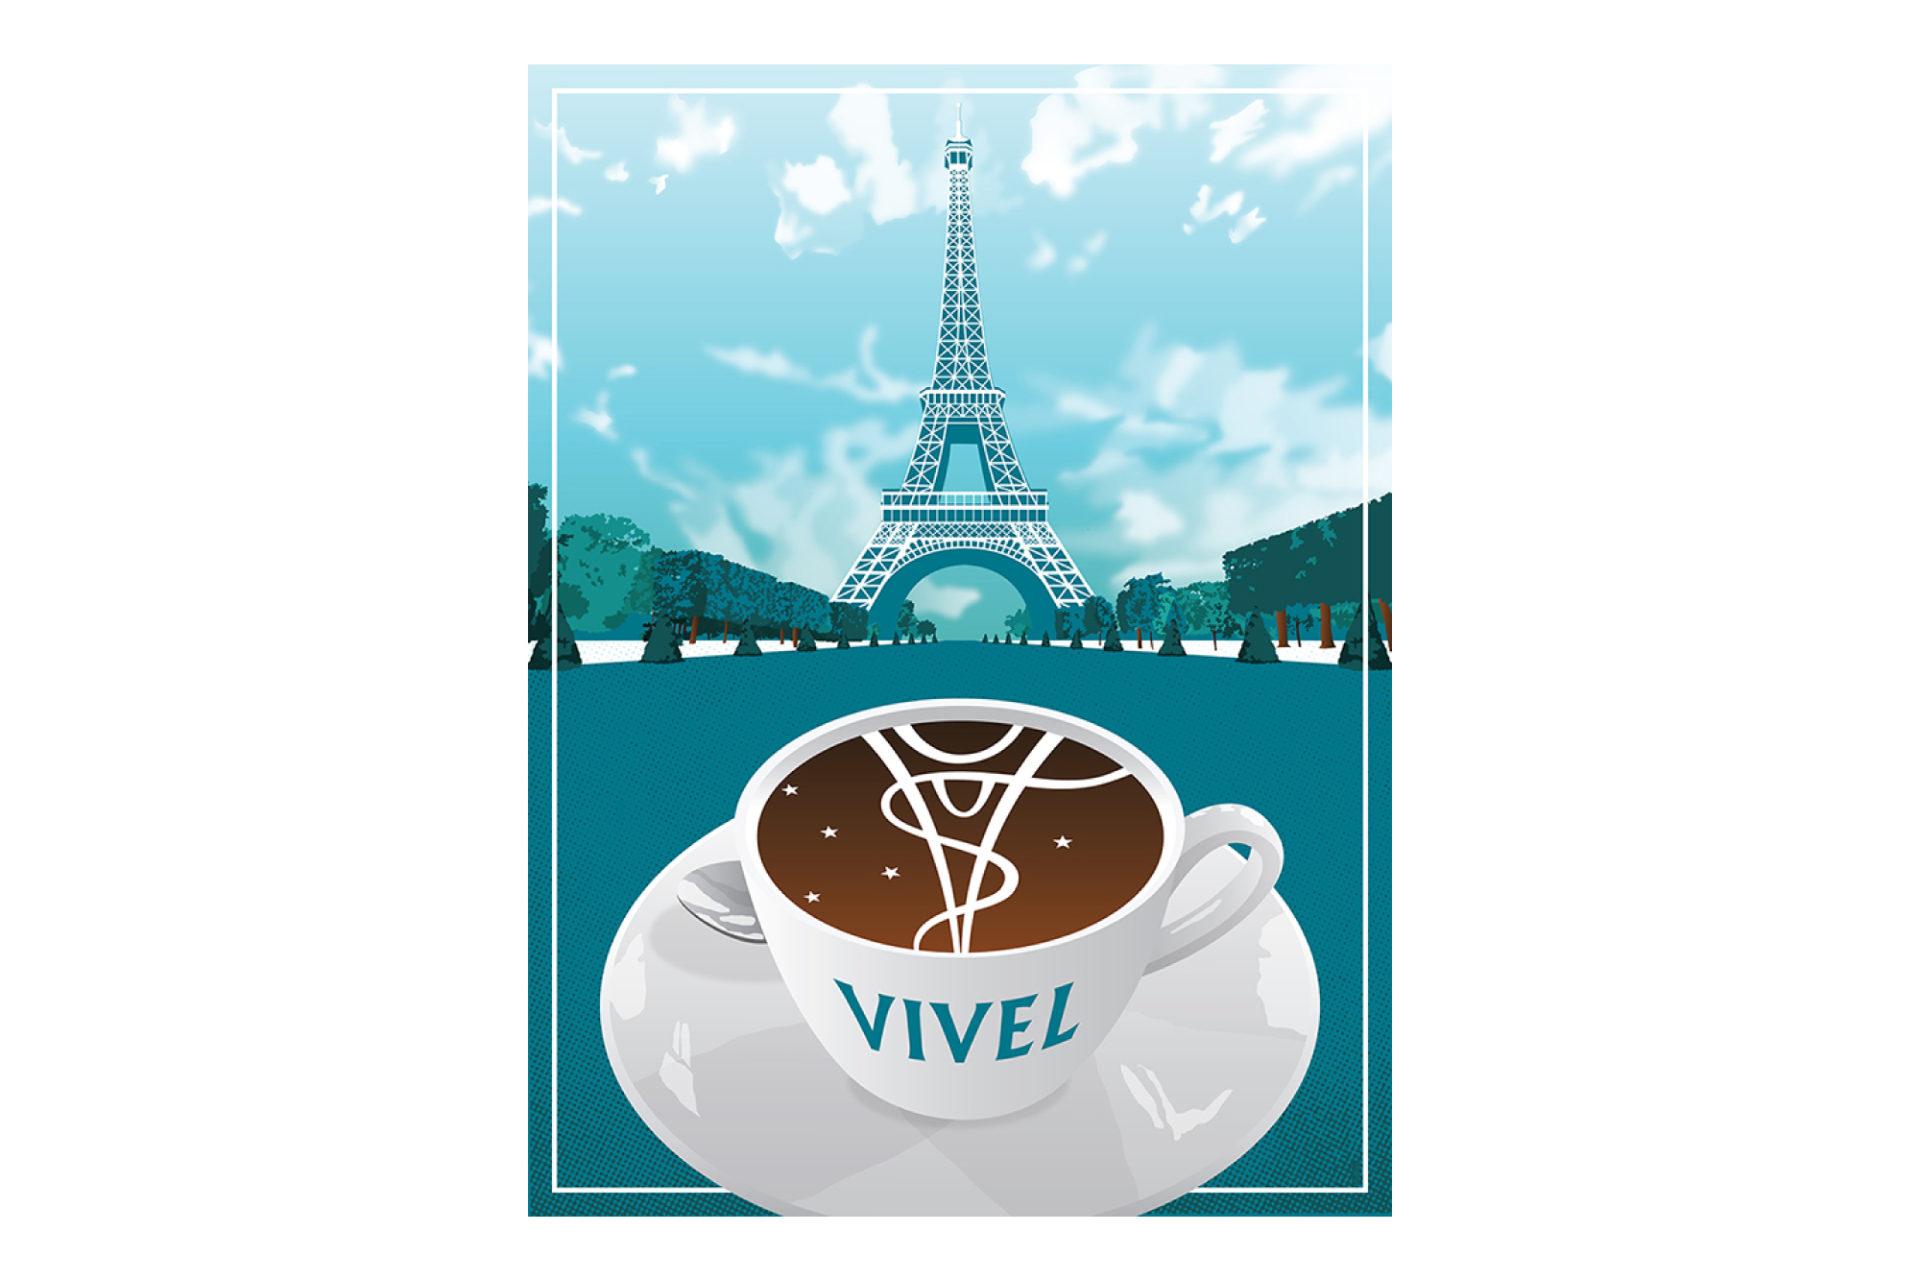 2019_VivelPoster